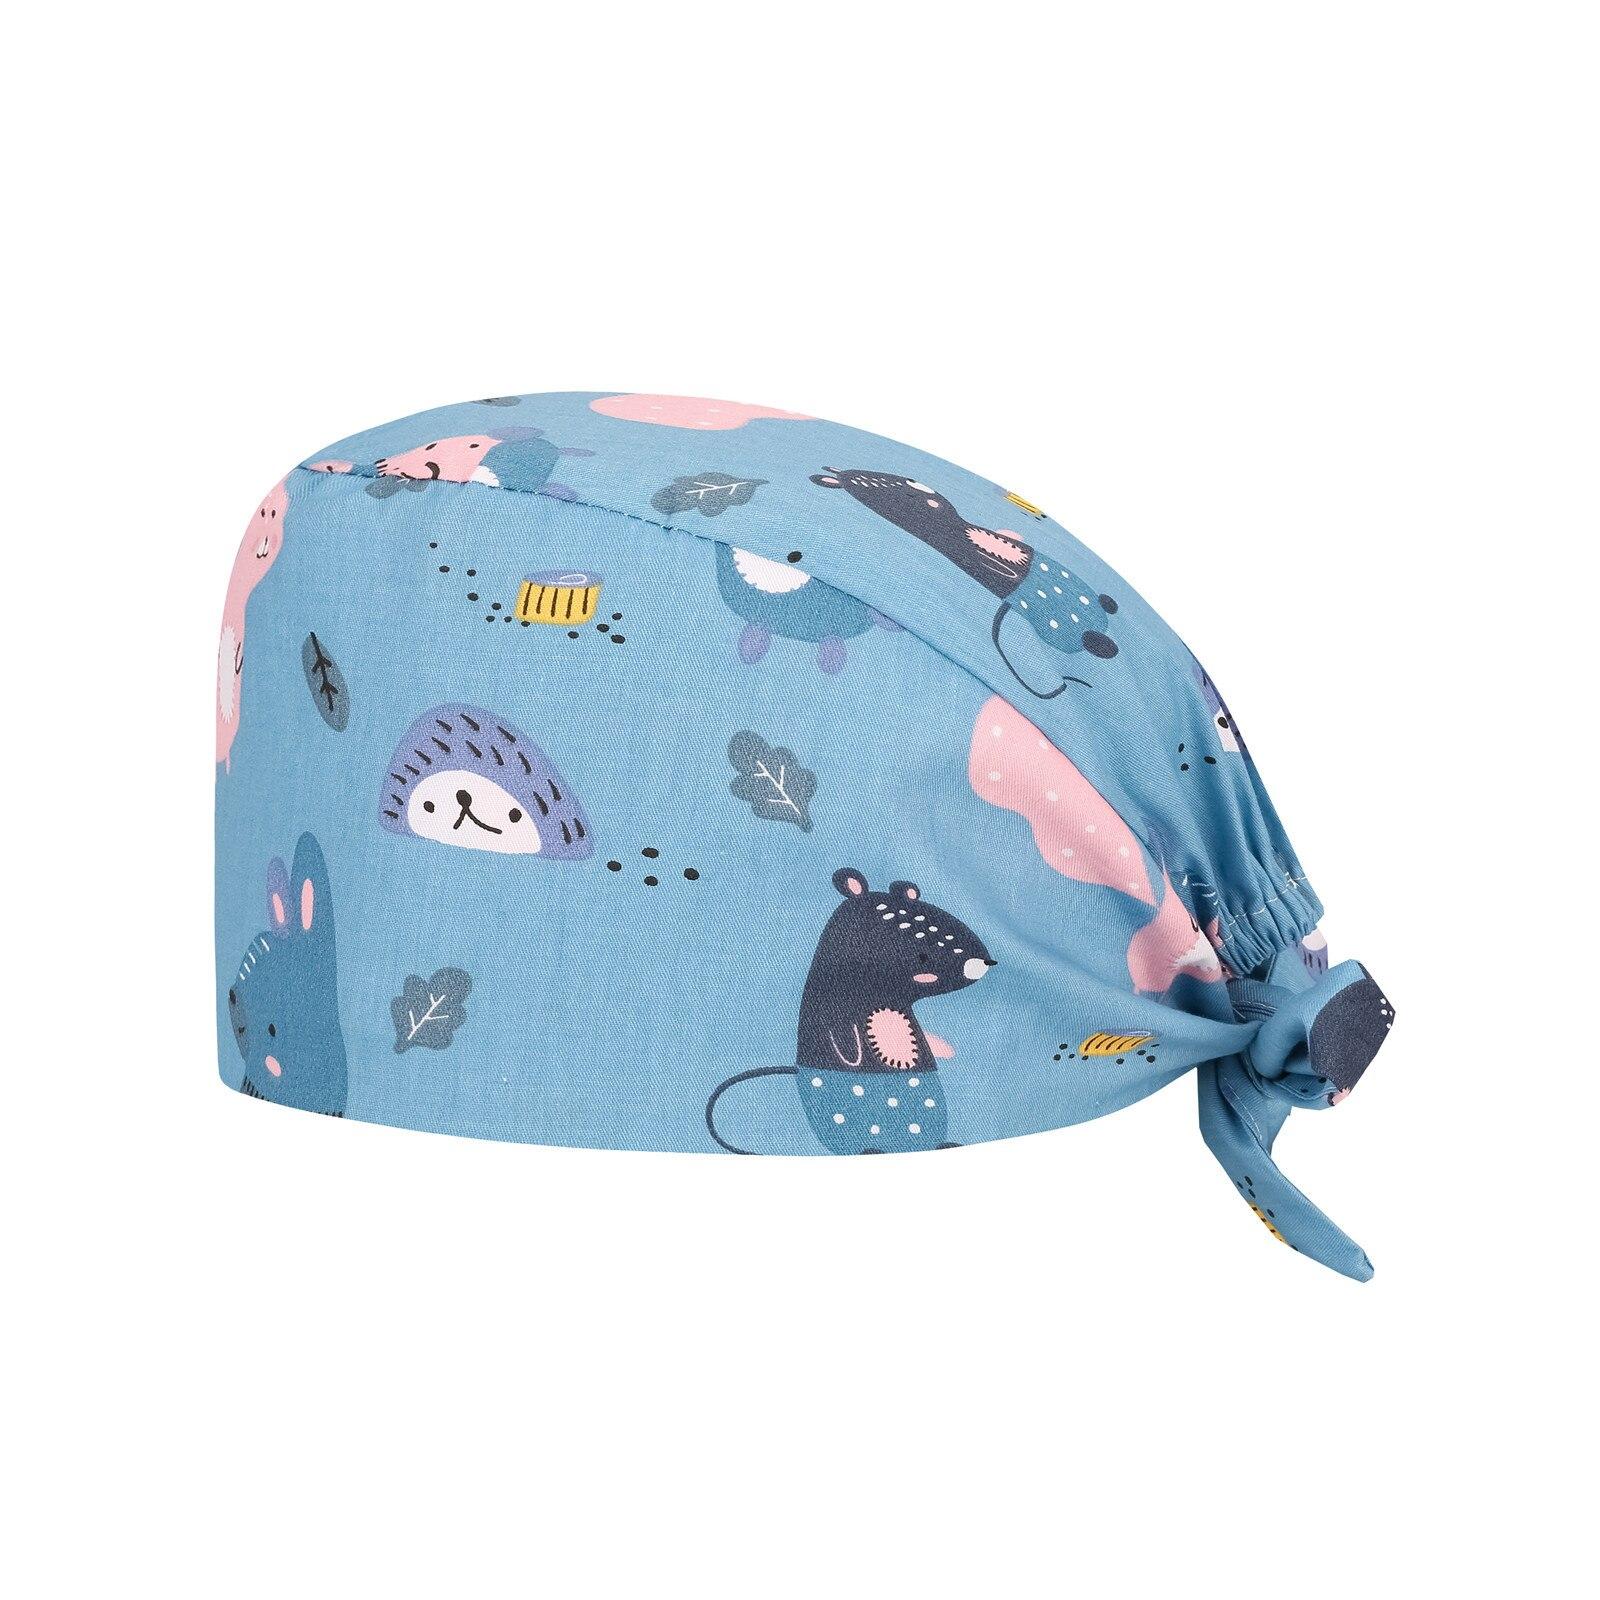 Health Service Scrubs Women Hat Adjustable Elastic Button Cartoon Print Cap Pet Beauty Work Hats wit